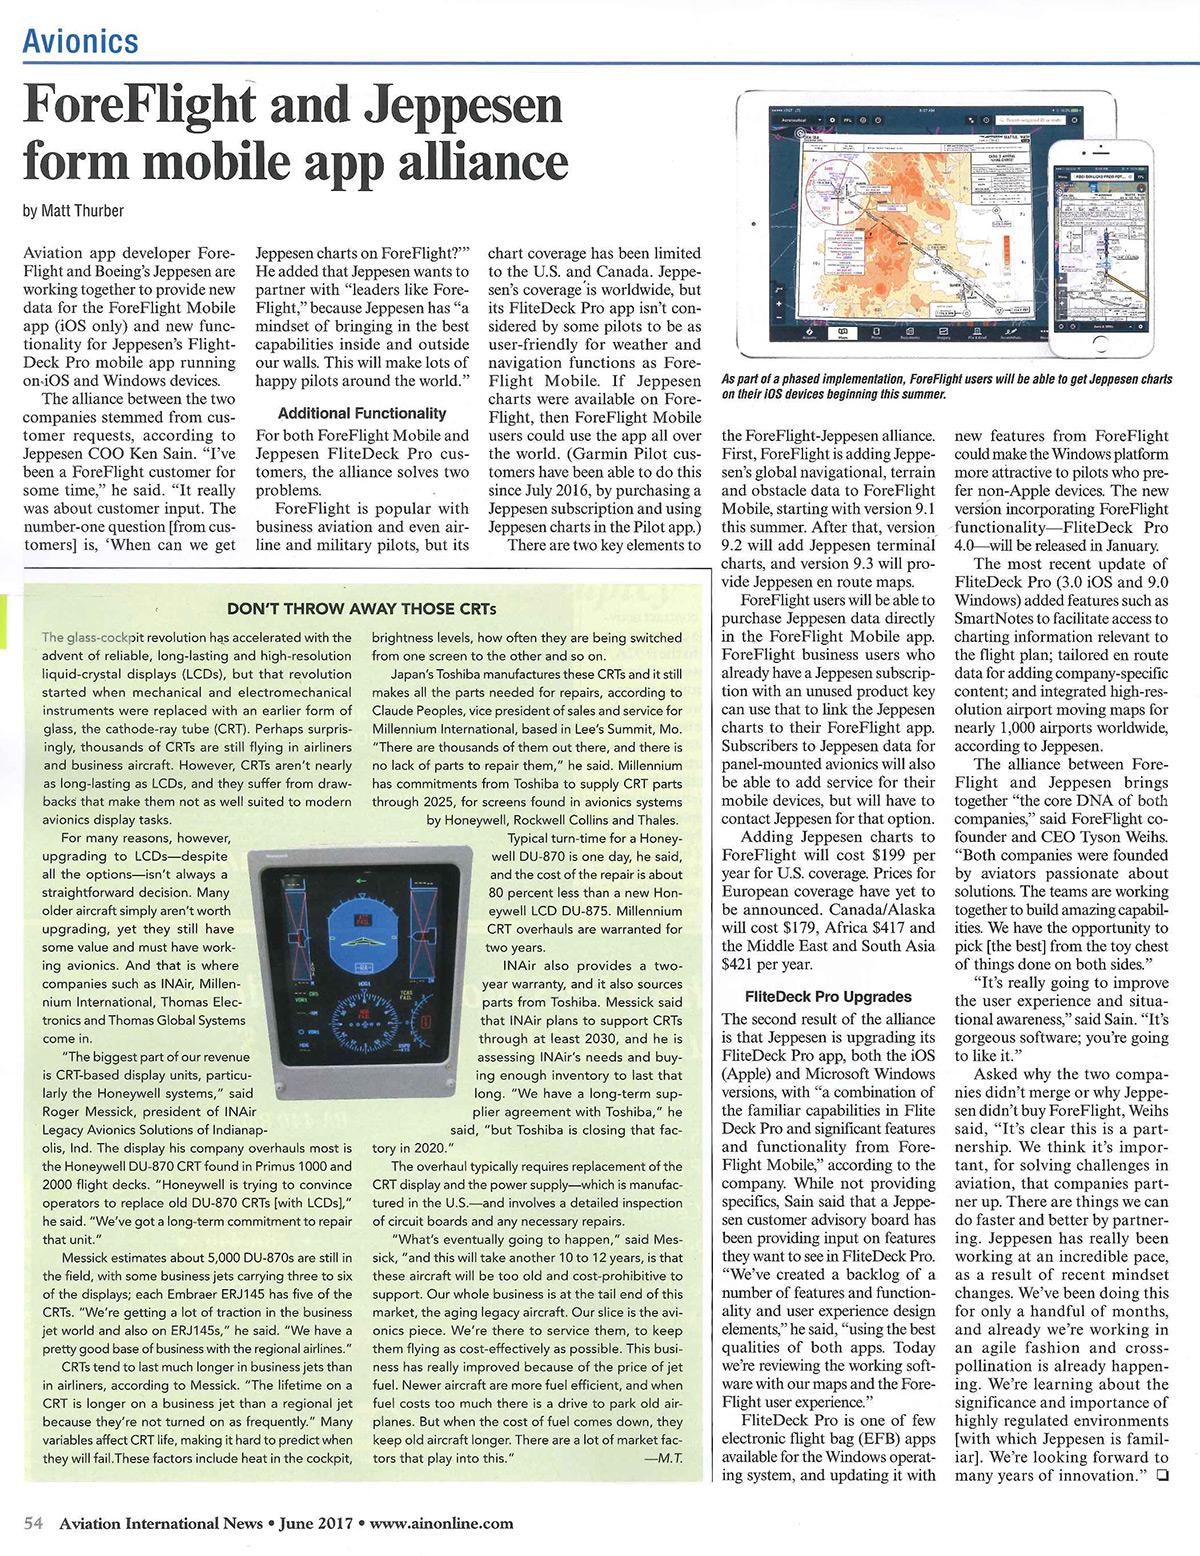 Recent AIN Editorial